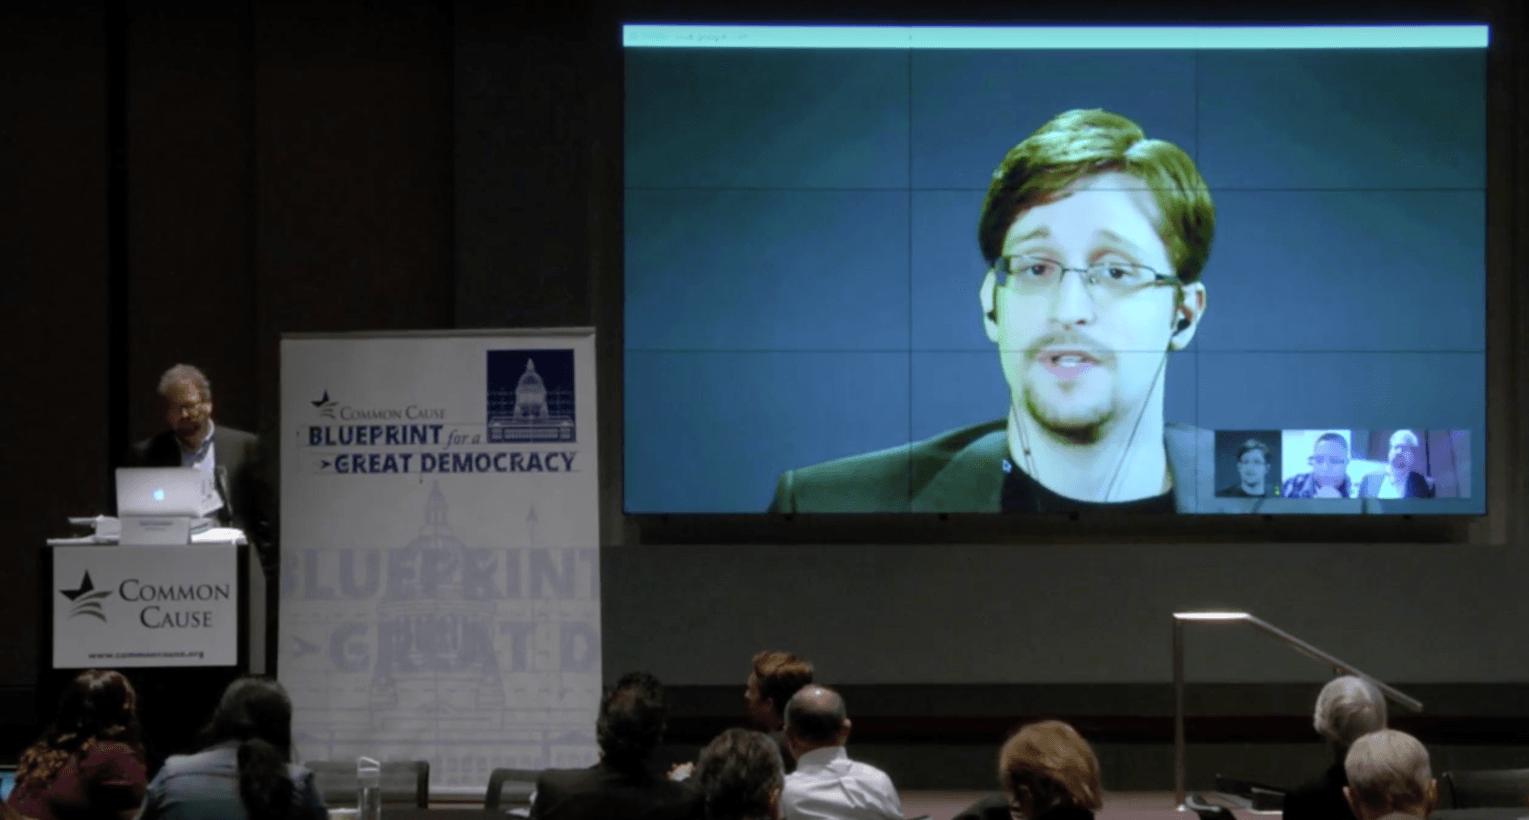 Snowden: FBI's claim that it requires Apple's help to unlock iPhone is 'bullshit'